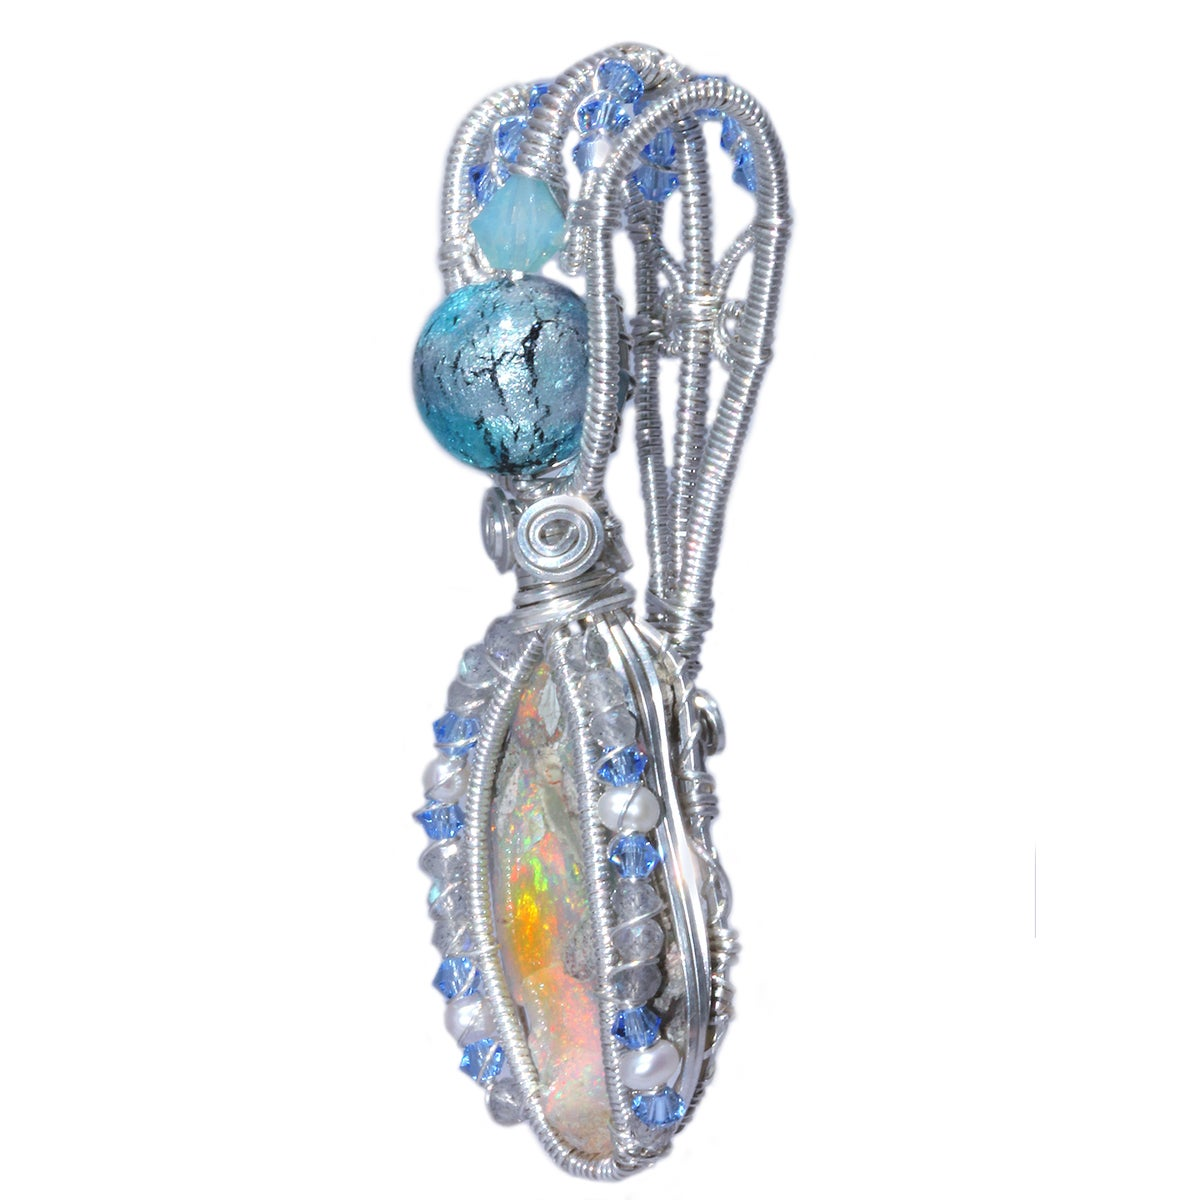 Ethiopian Opal Handmade Pendant with Labradorite and Venetian Glass Bead